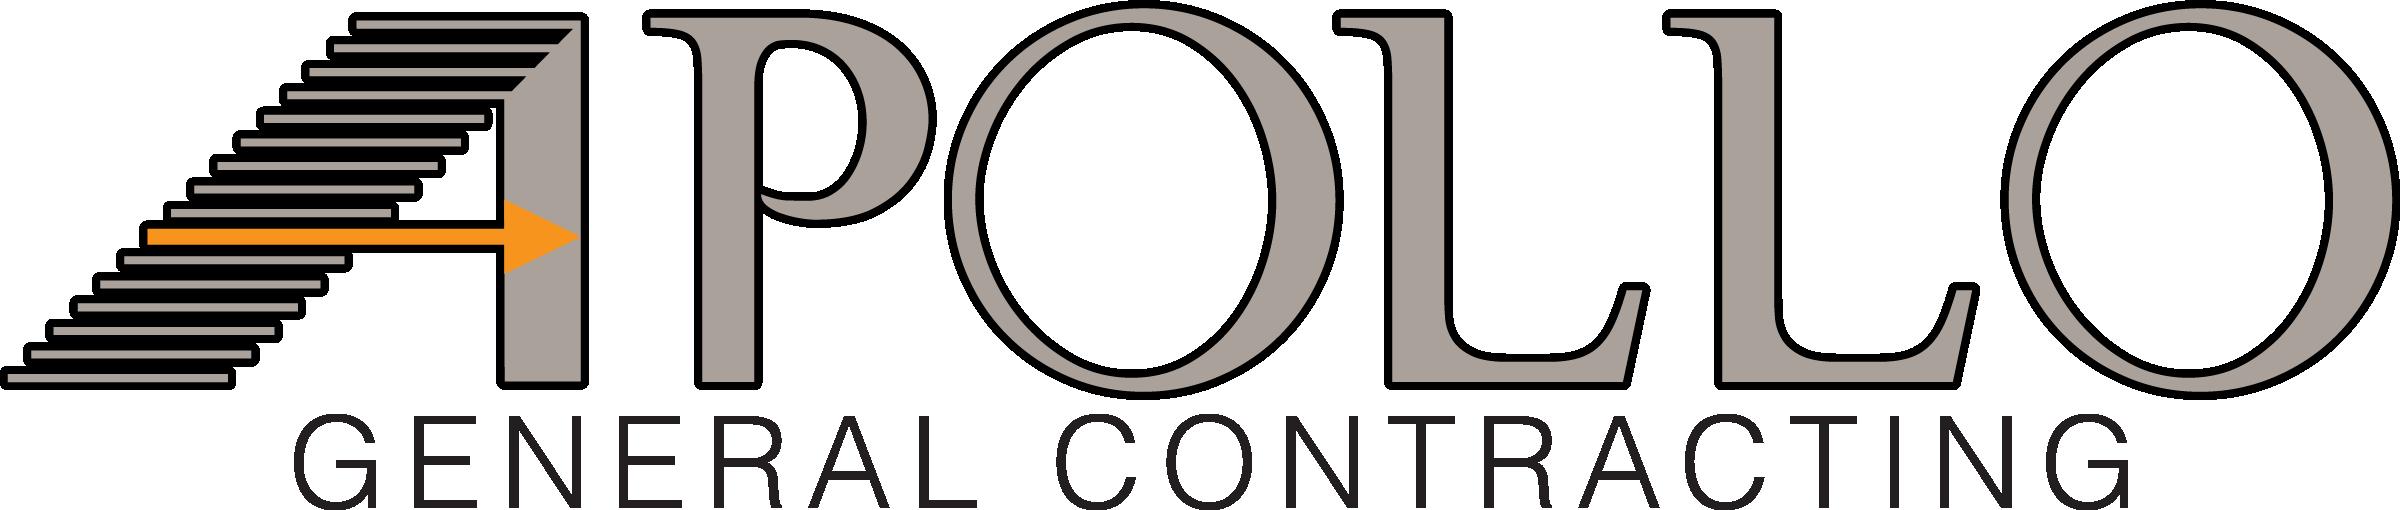 Apollo General Contracting Dayton General Contractors: The #1 General Contractors in Dayton